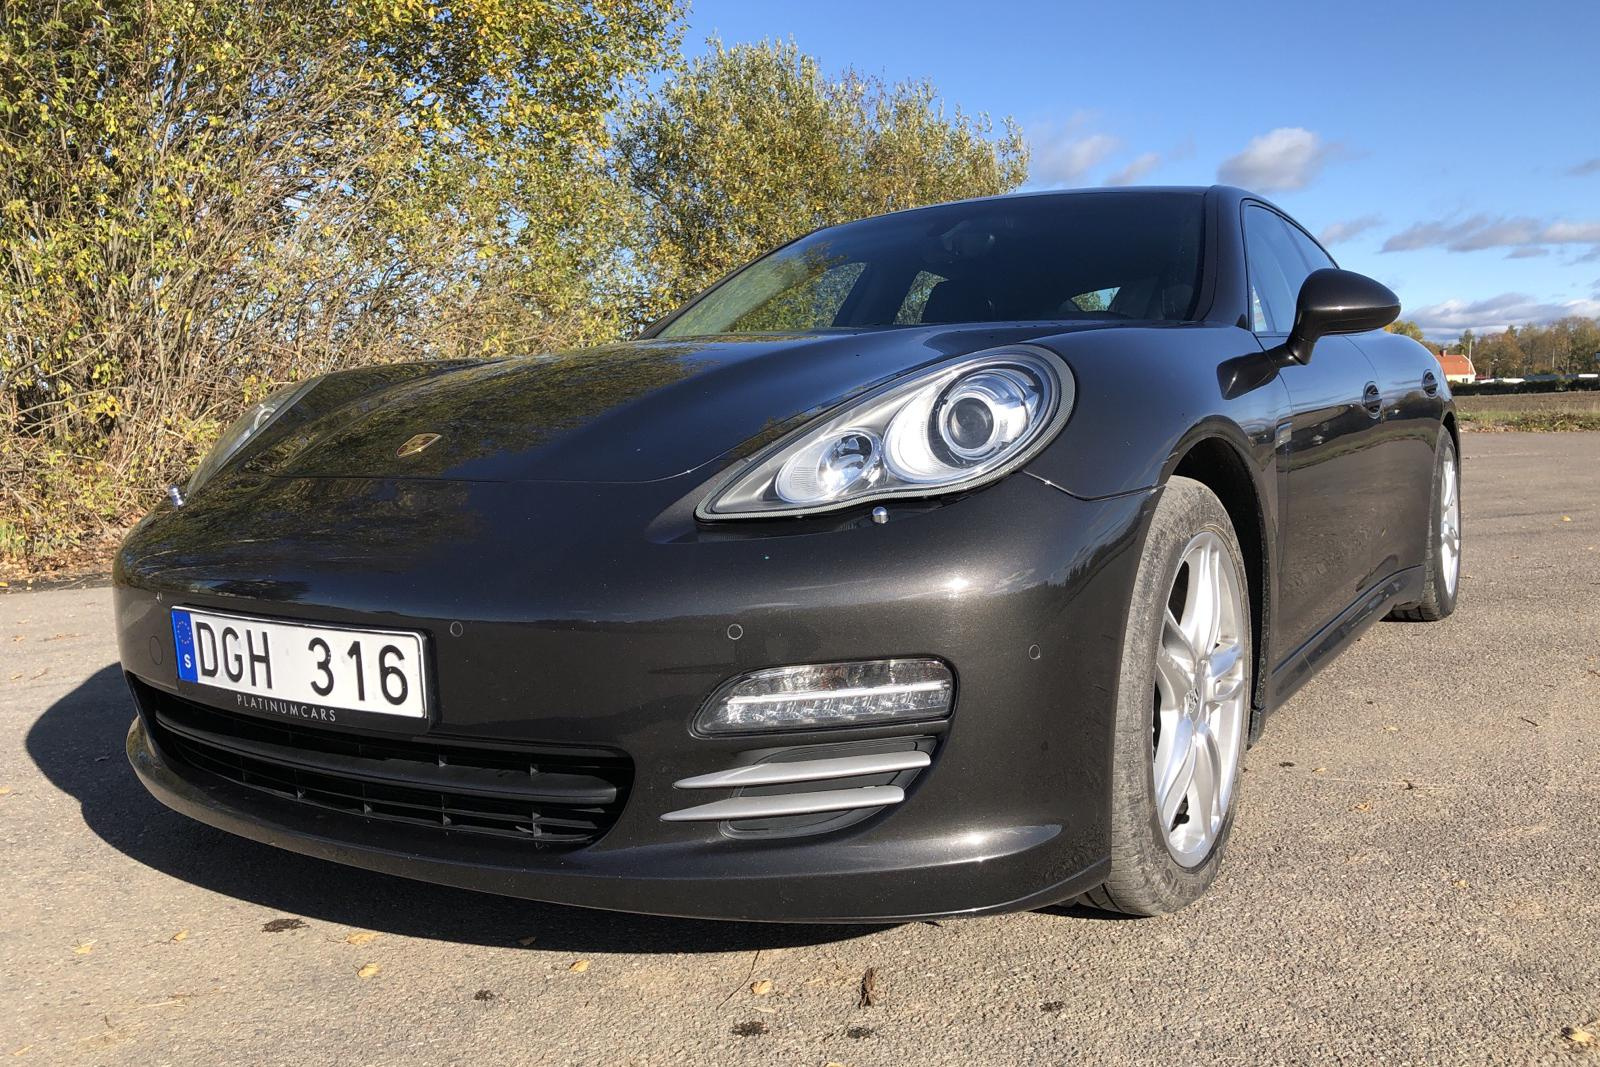 Porsche Panamera 4 (300hk) - 82 790 km - Automatic - Dark Grey - 2012